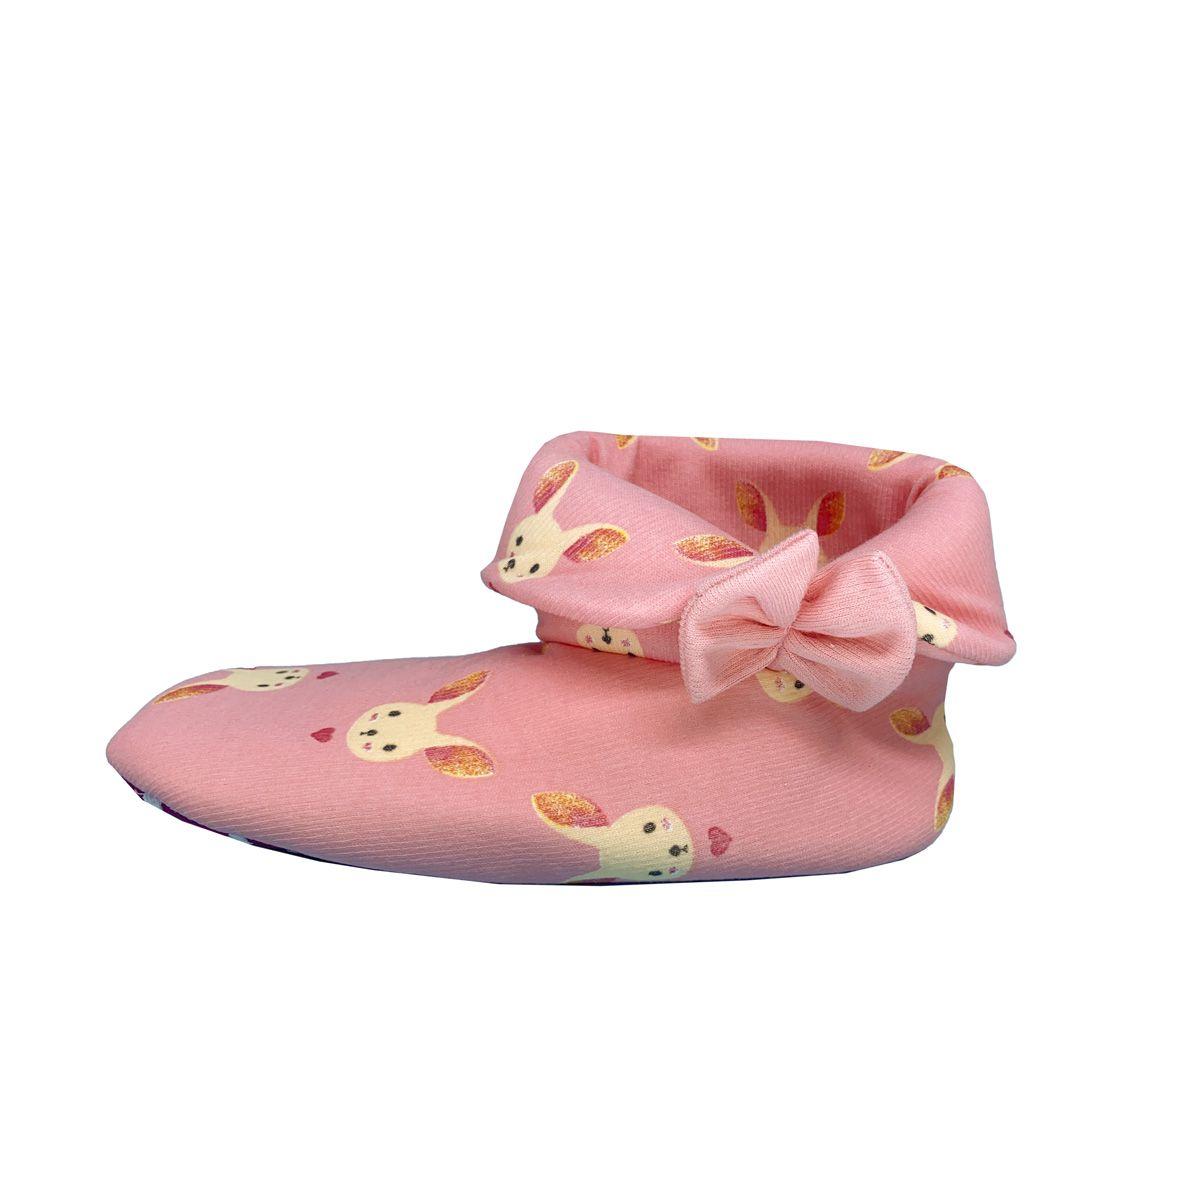 Pantufa feminina botinha de coelhinho Victory